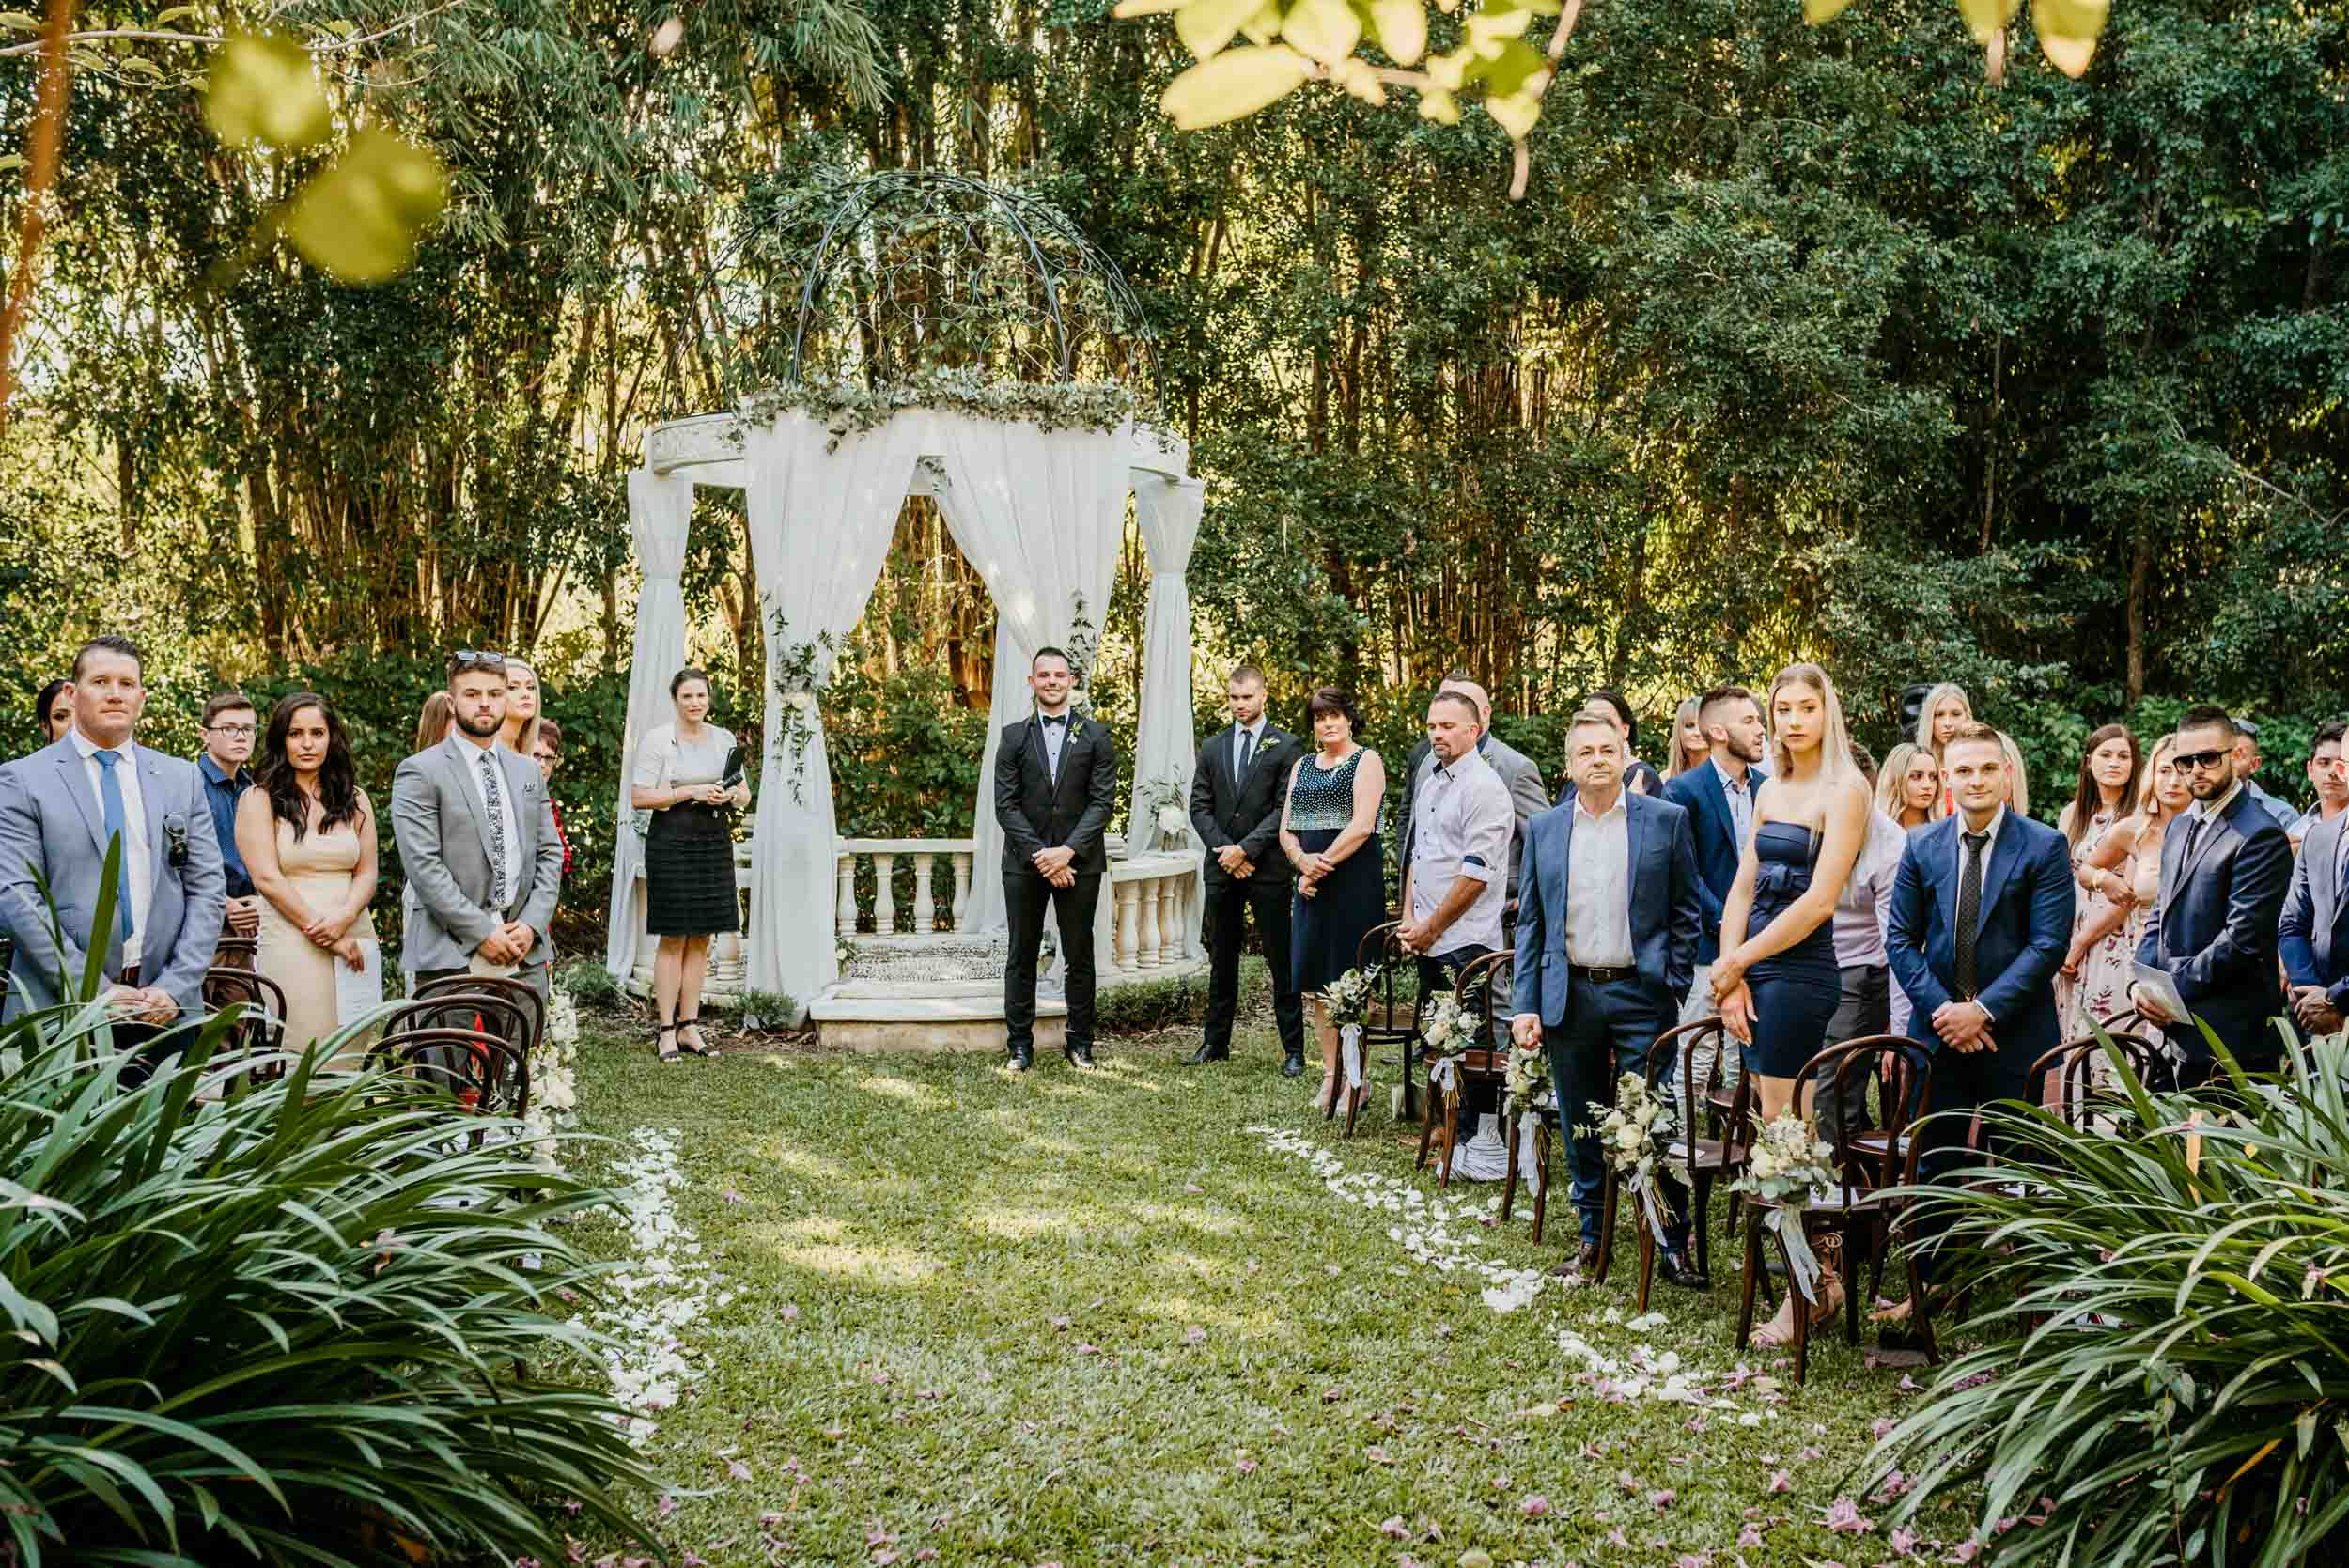 The Raw Photographer - Cairns Wedding Photographer - Laloli - Cairns Garden Wedding - Bride Dress - Destination Wed - Outdoor Reception - Queensland Ceremony-25.jpg